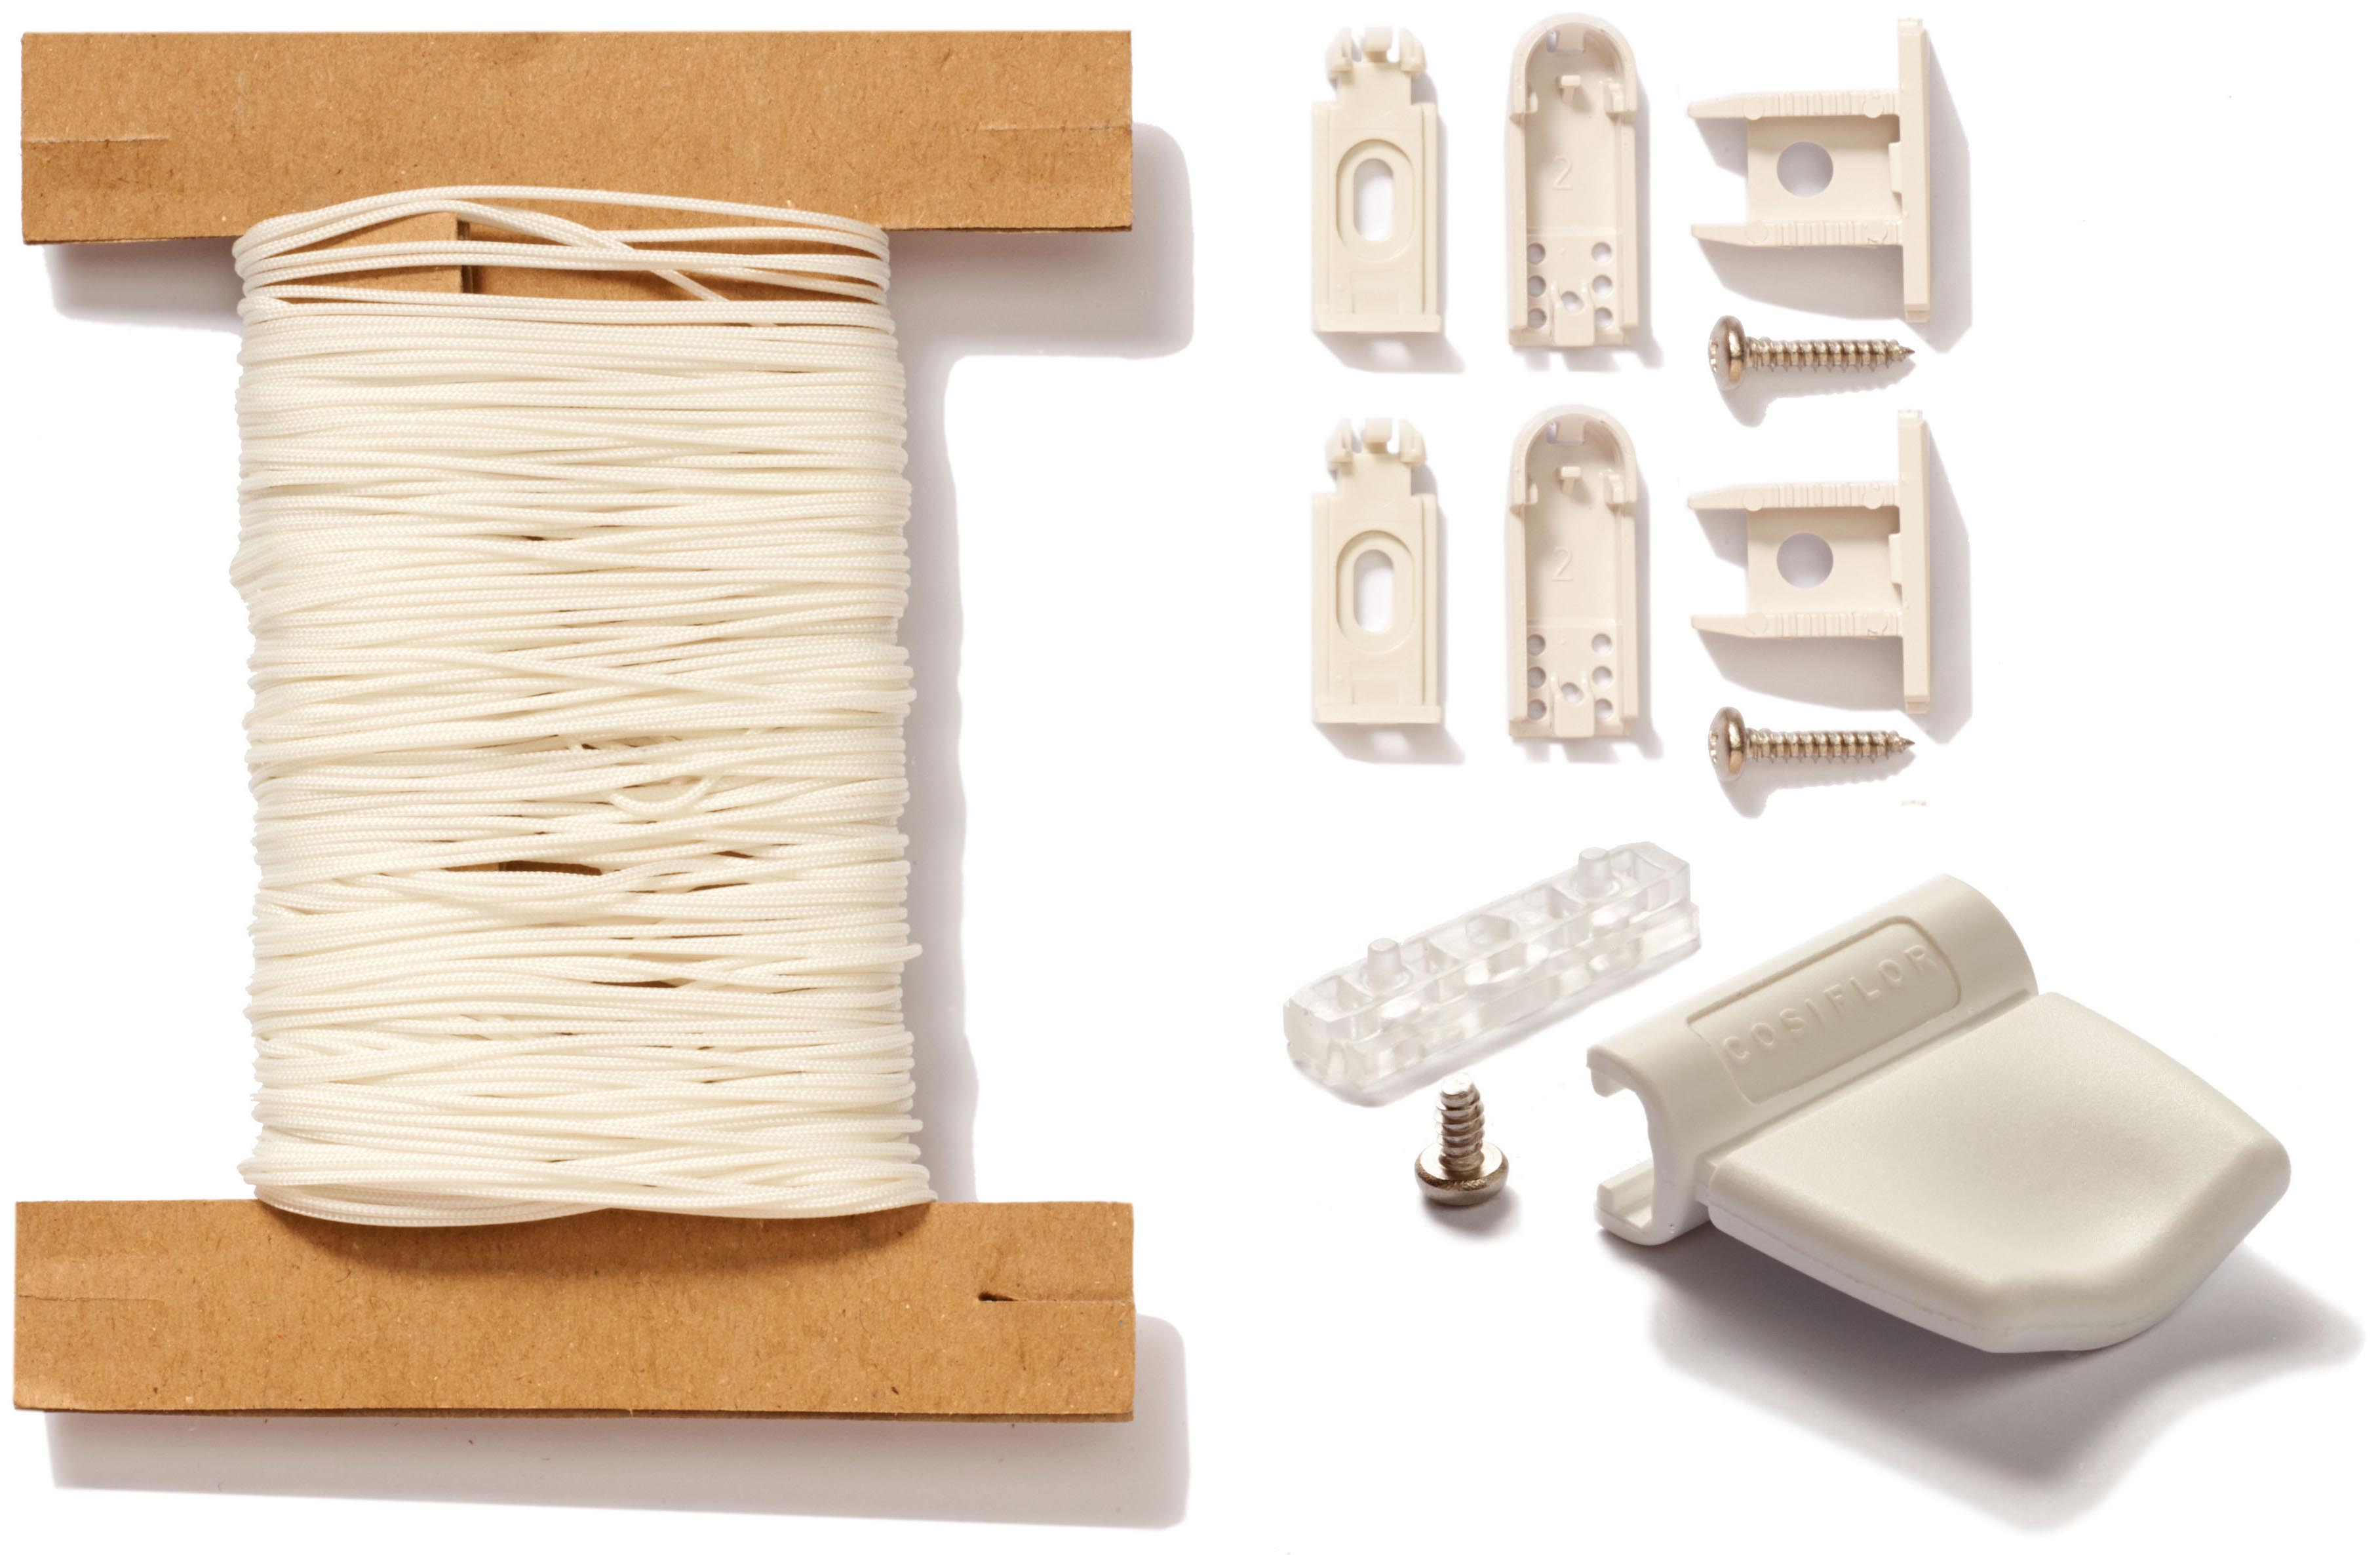 ersatzteile zur reparatur von cosiflor plissees plissee reparatur set gro. Black Bedroom Furniture Sets. Home Design Ideas